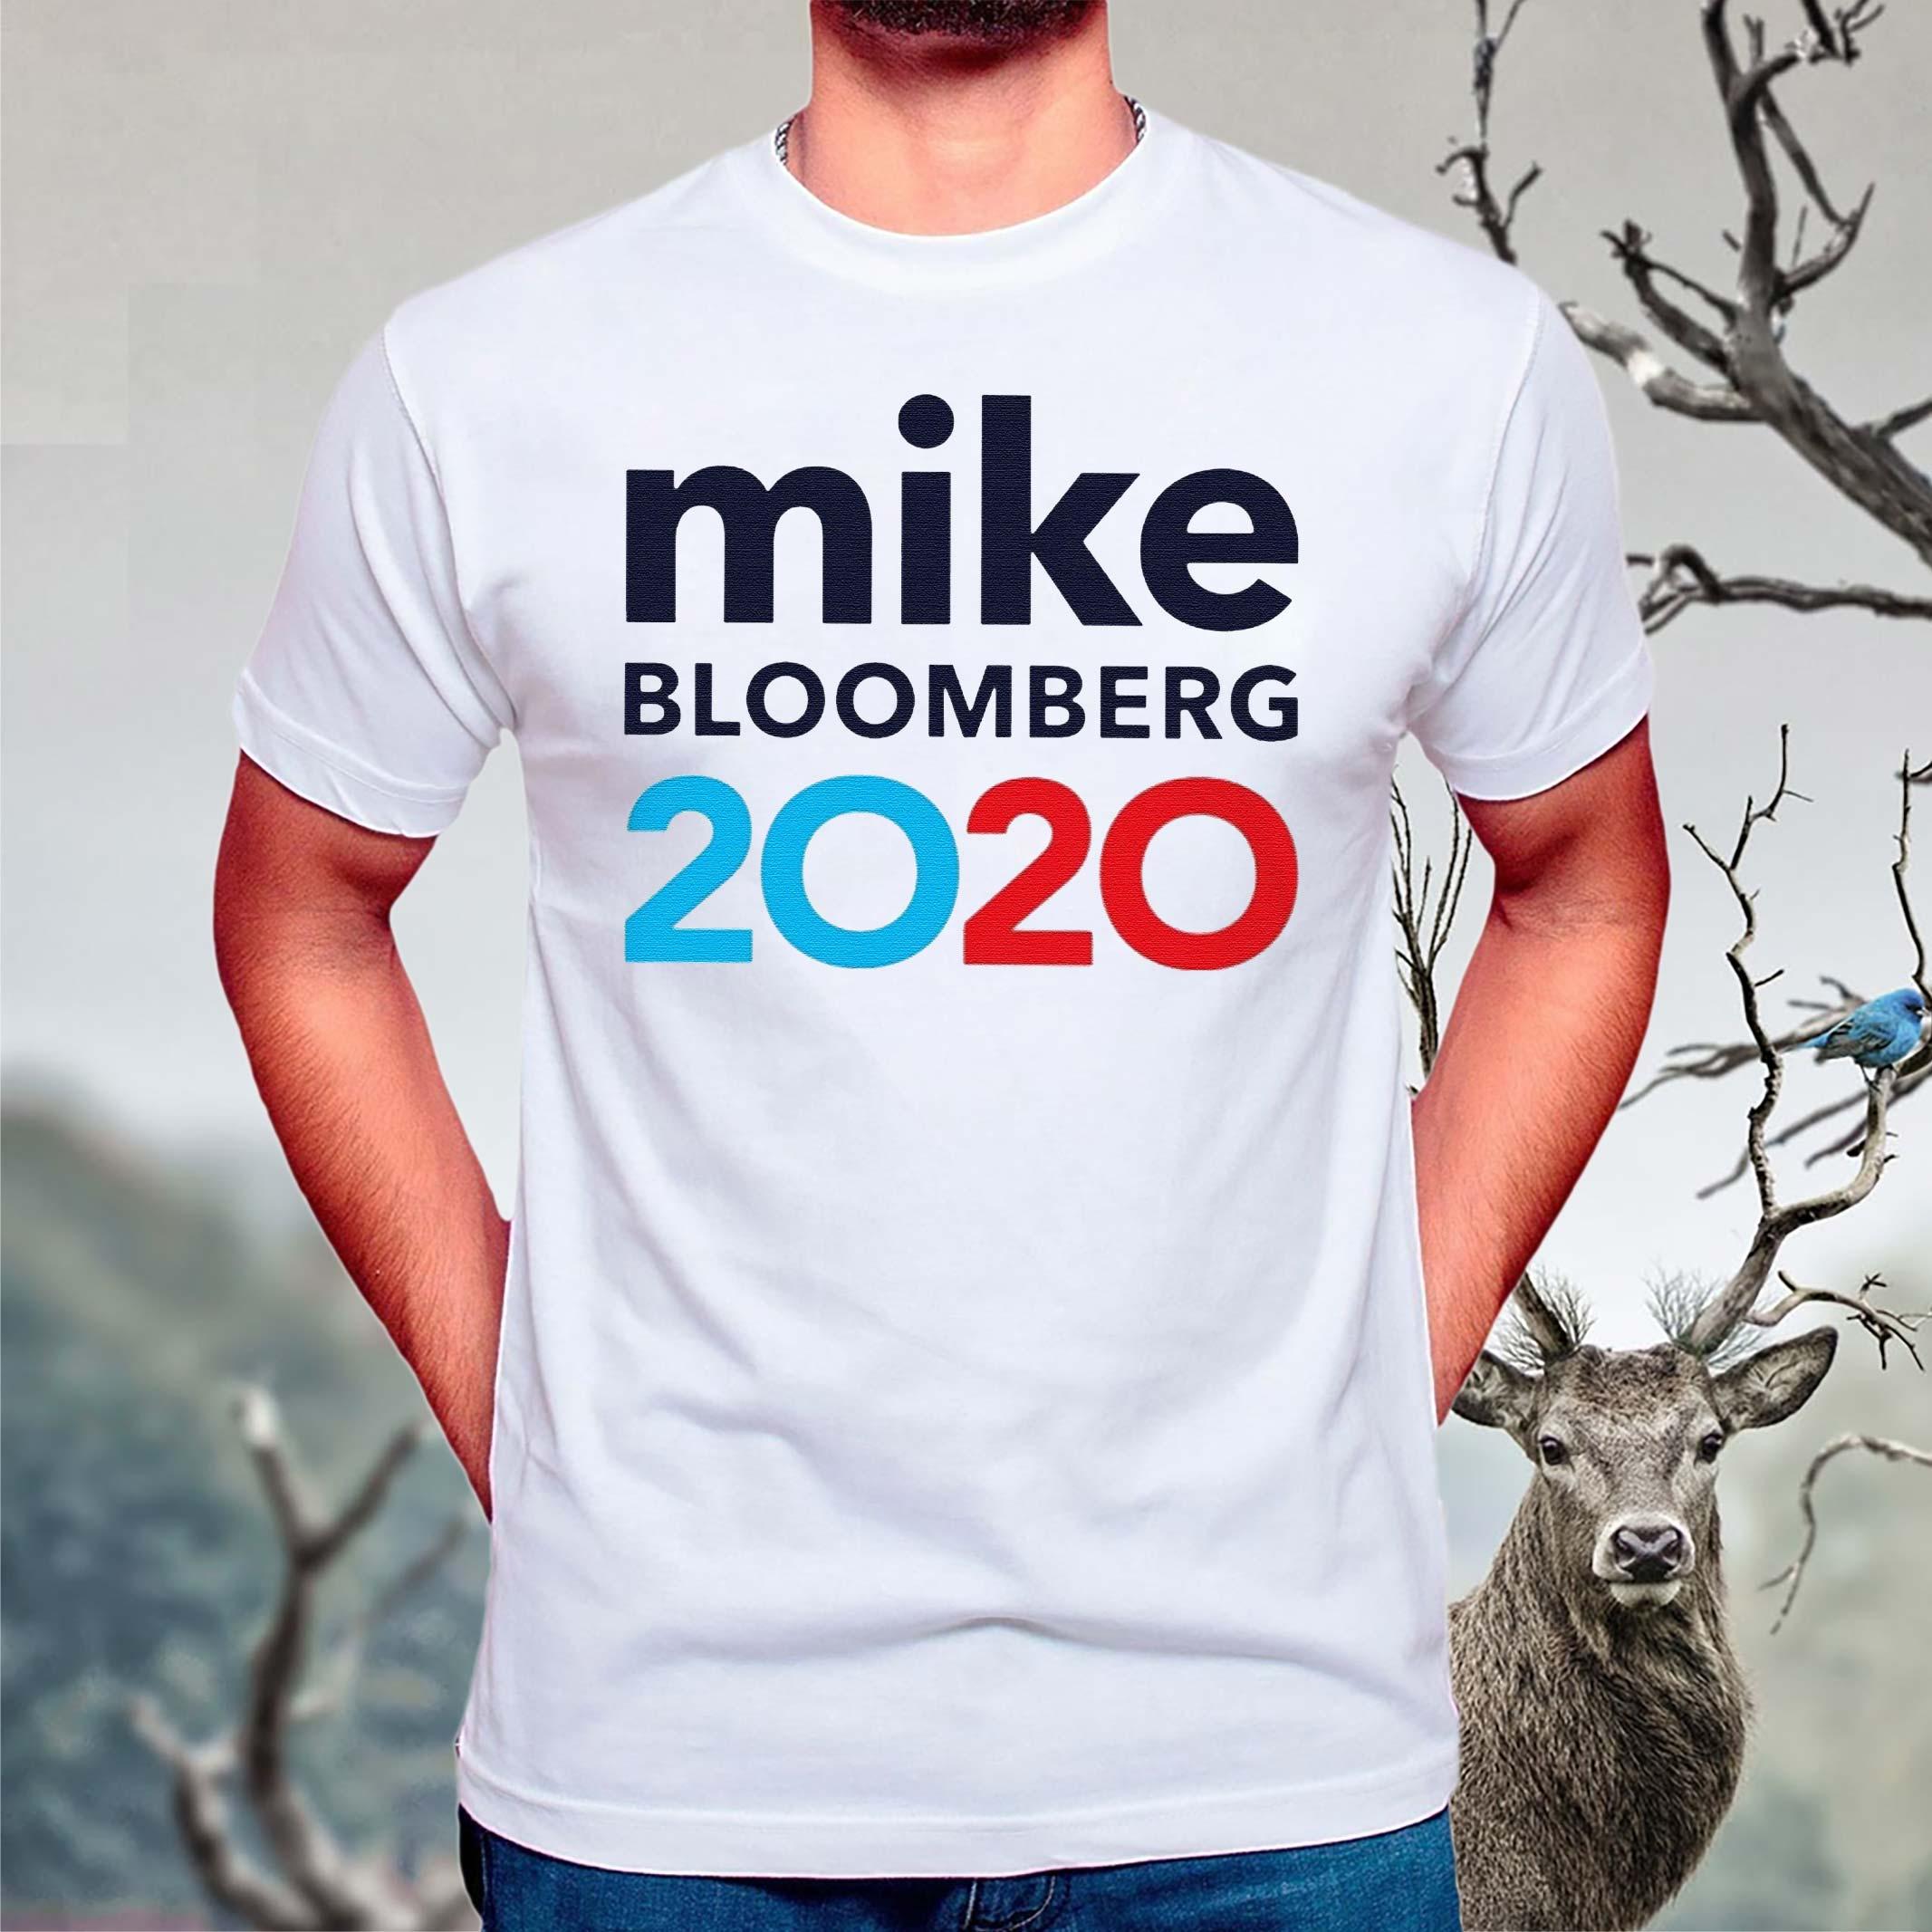 mike-bloomberg-2020-shirt